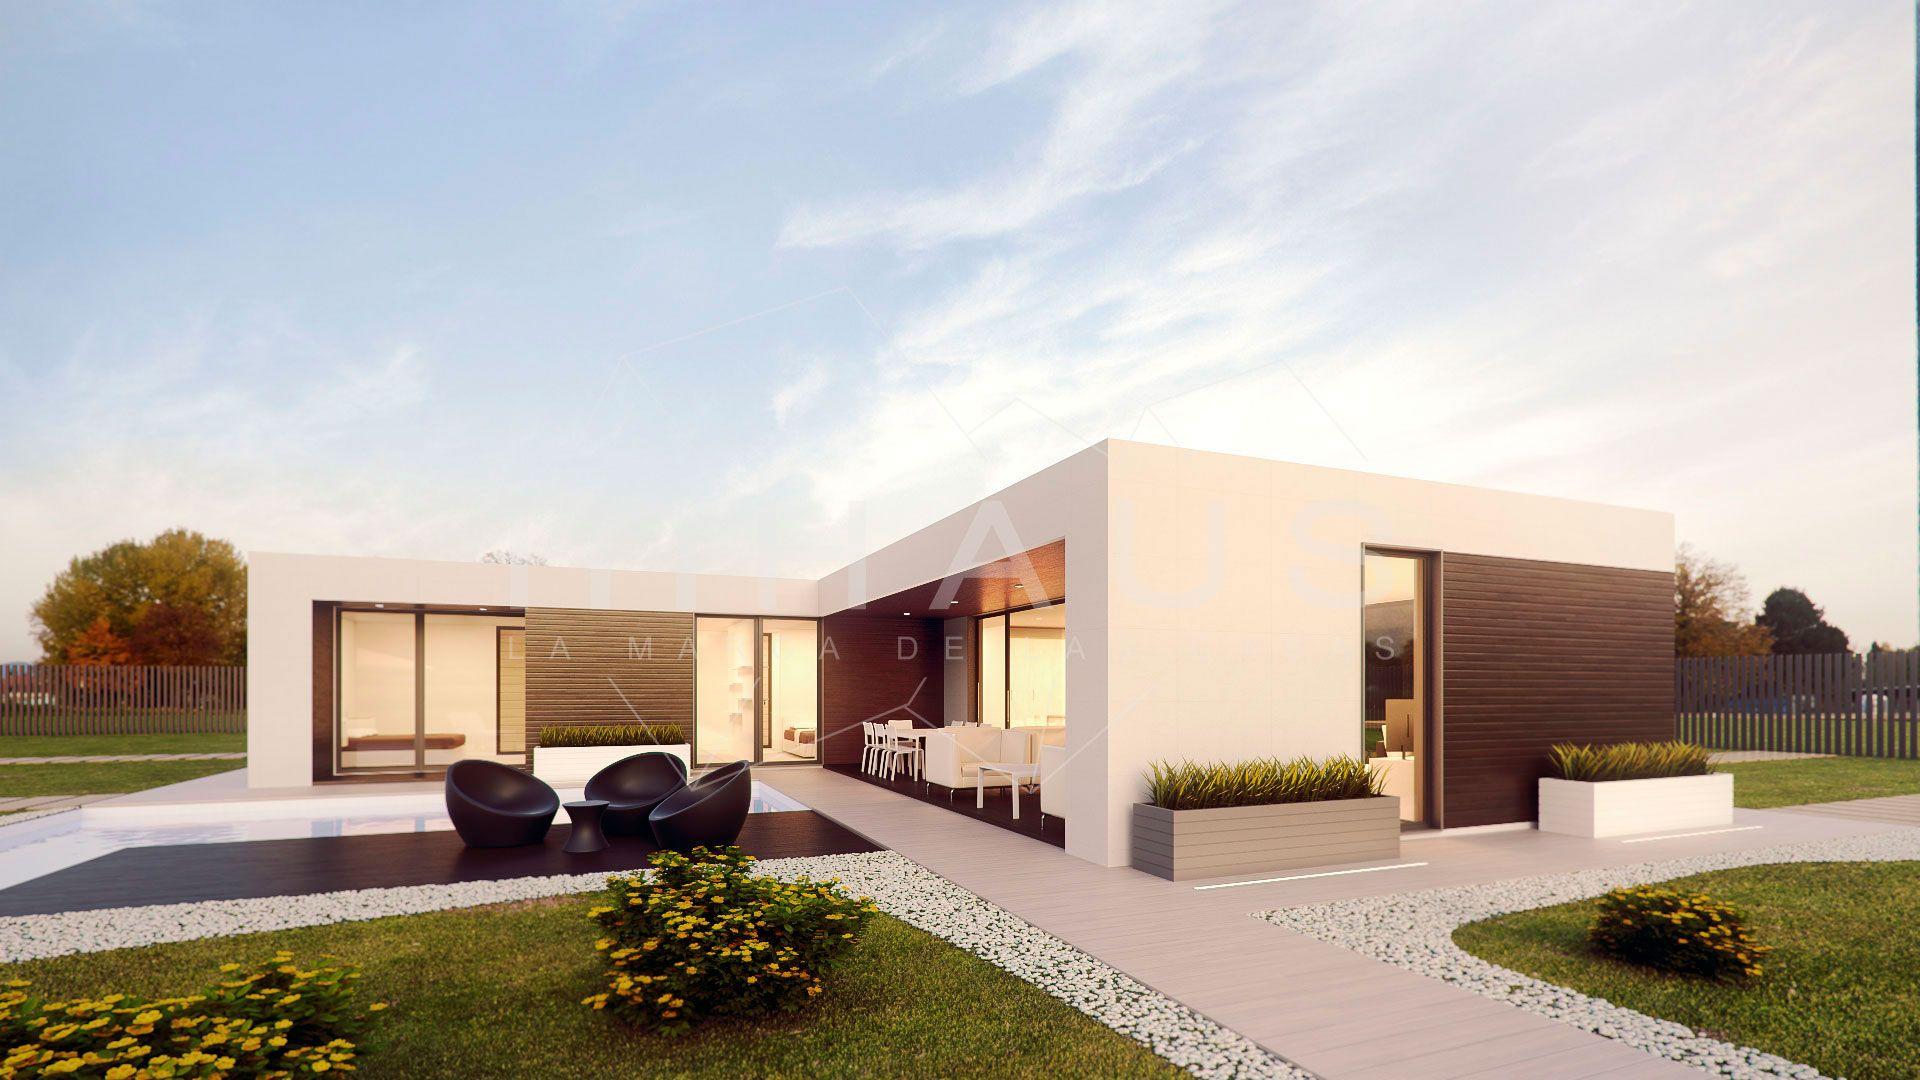 Viviendas modulares de dise o inhaus vista lateral motril for Casa vivienda jardin pdf